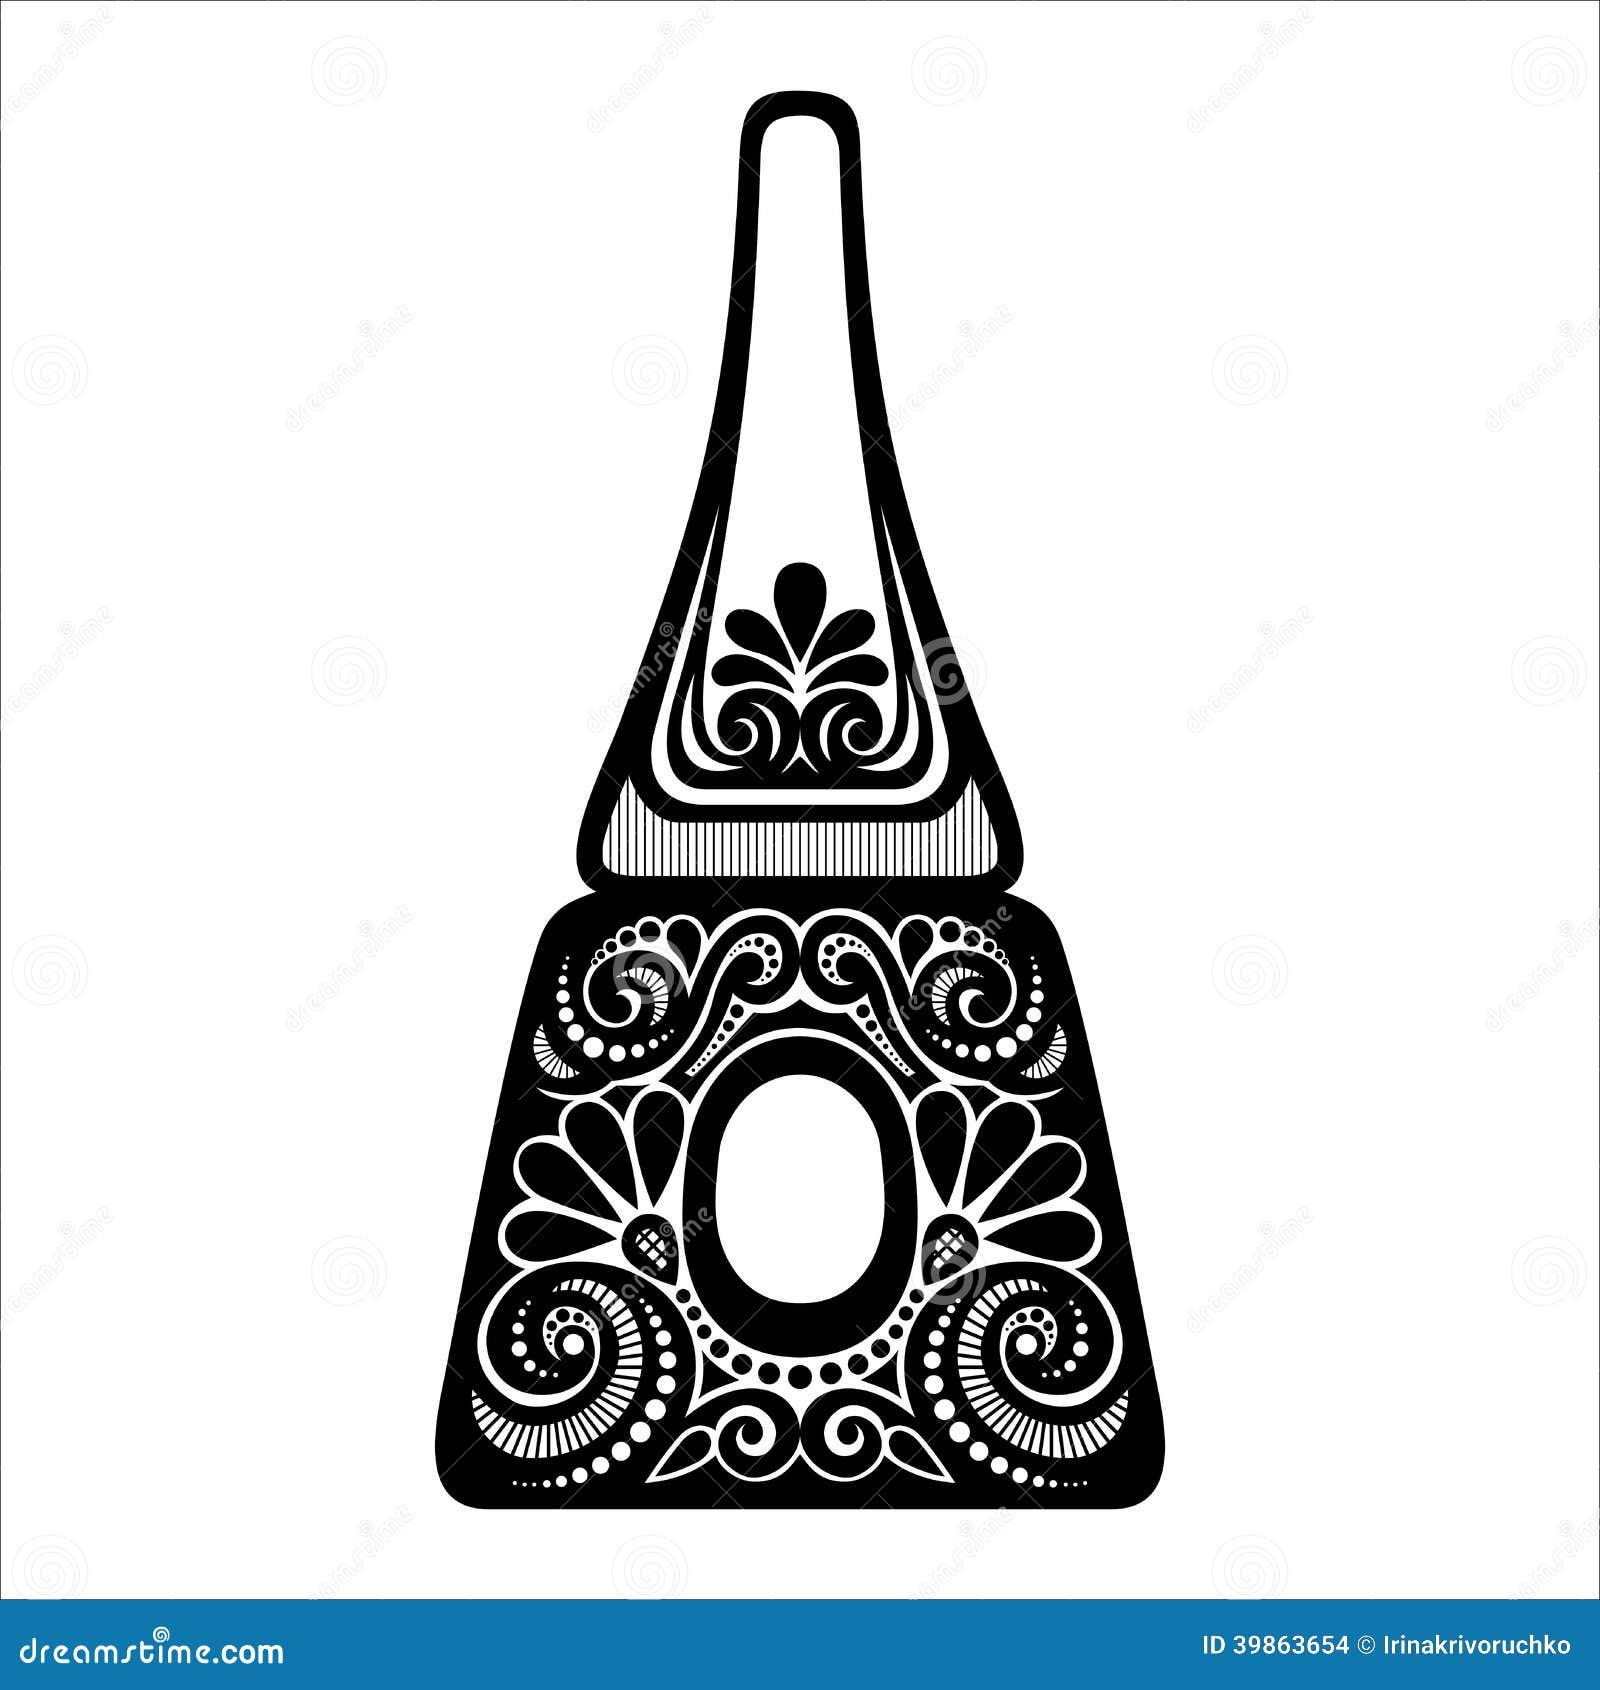 Fingernail designs vector